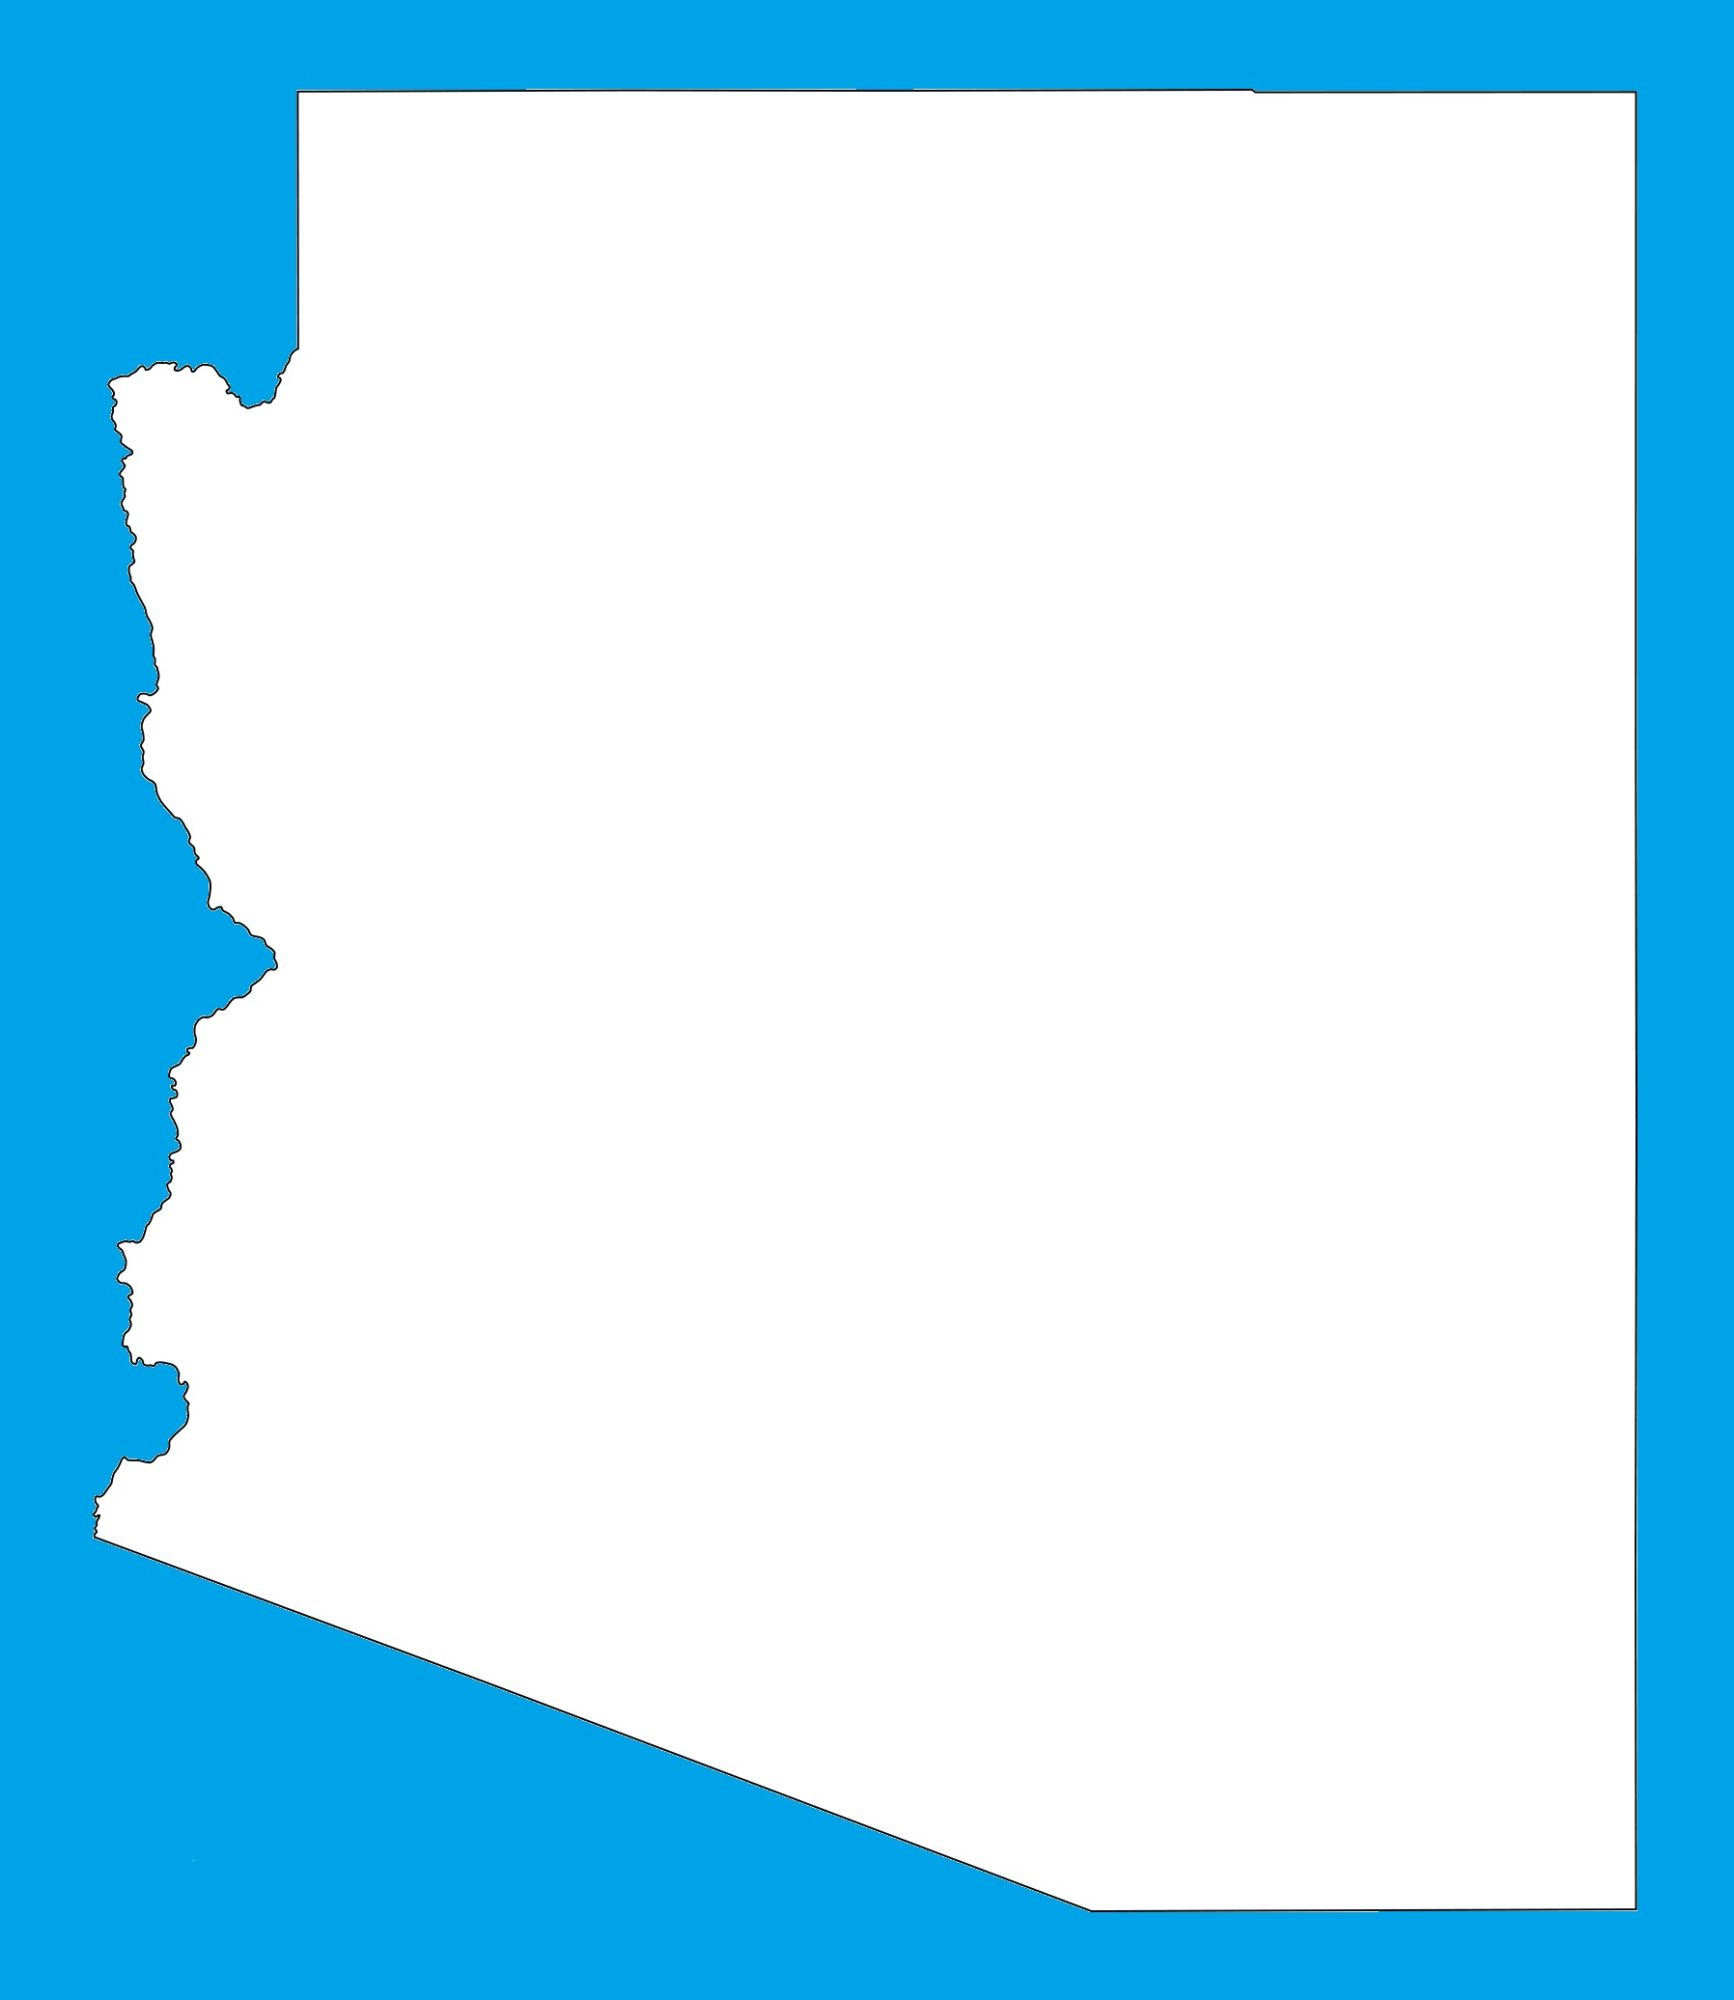 Arizona Blank Outline Map   Blank Outline Map of Arizona – 6